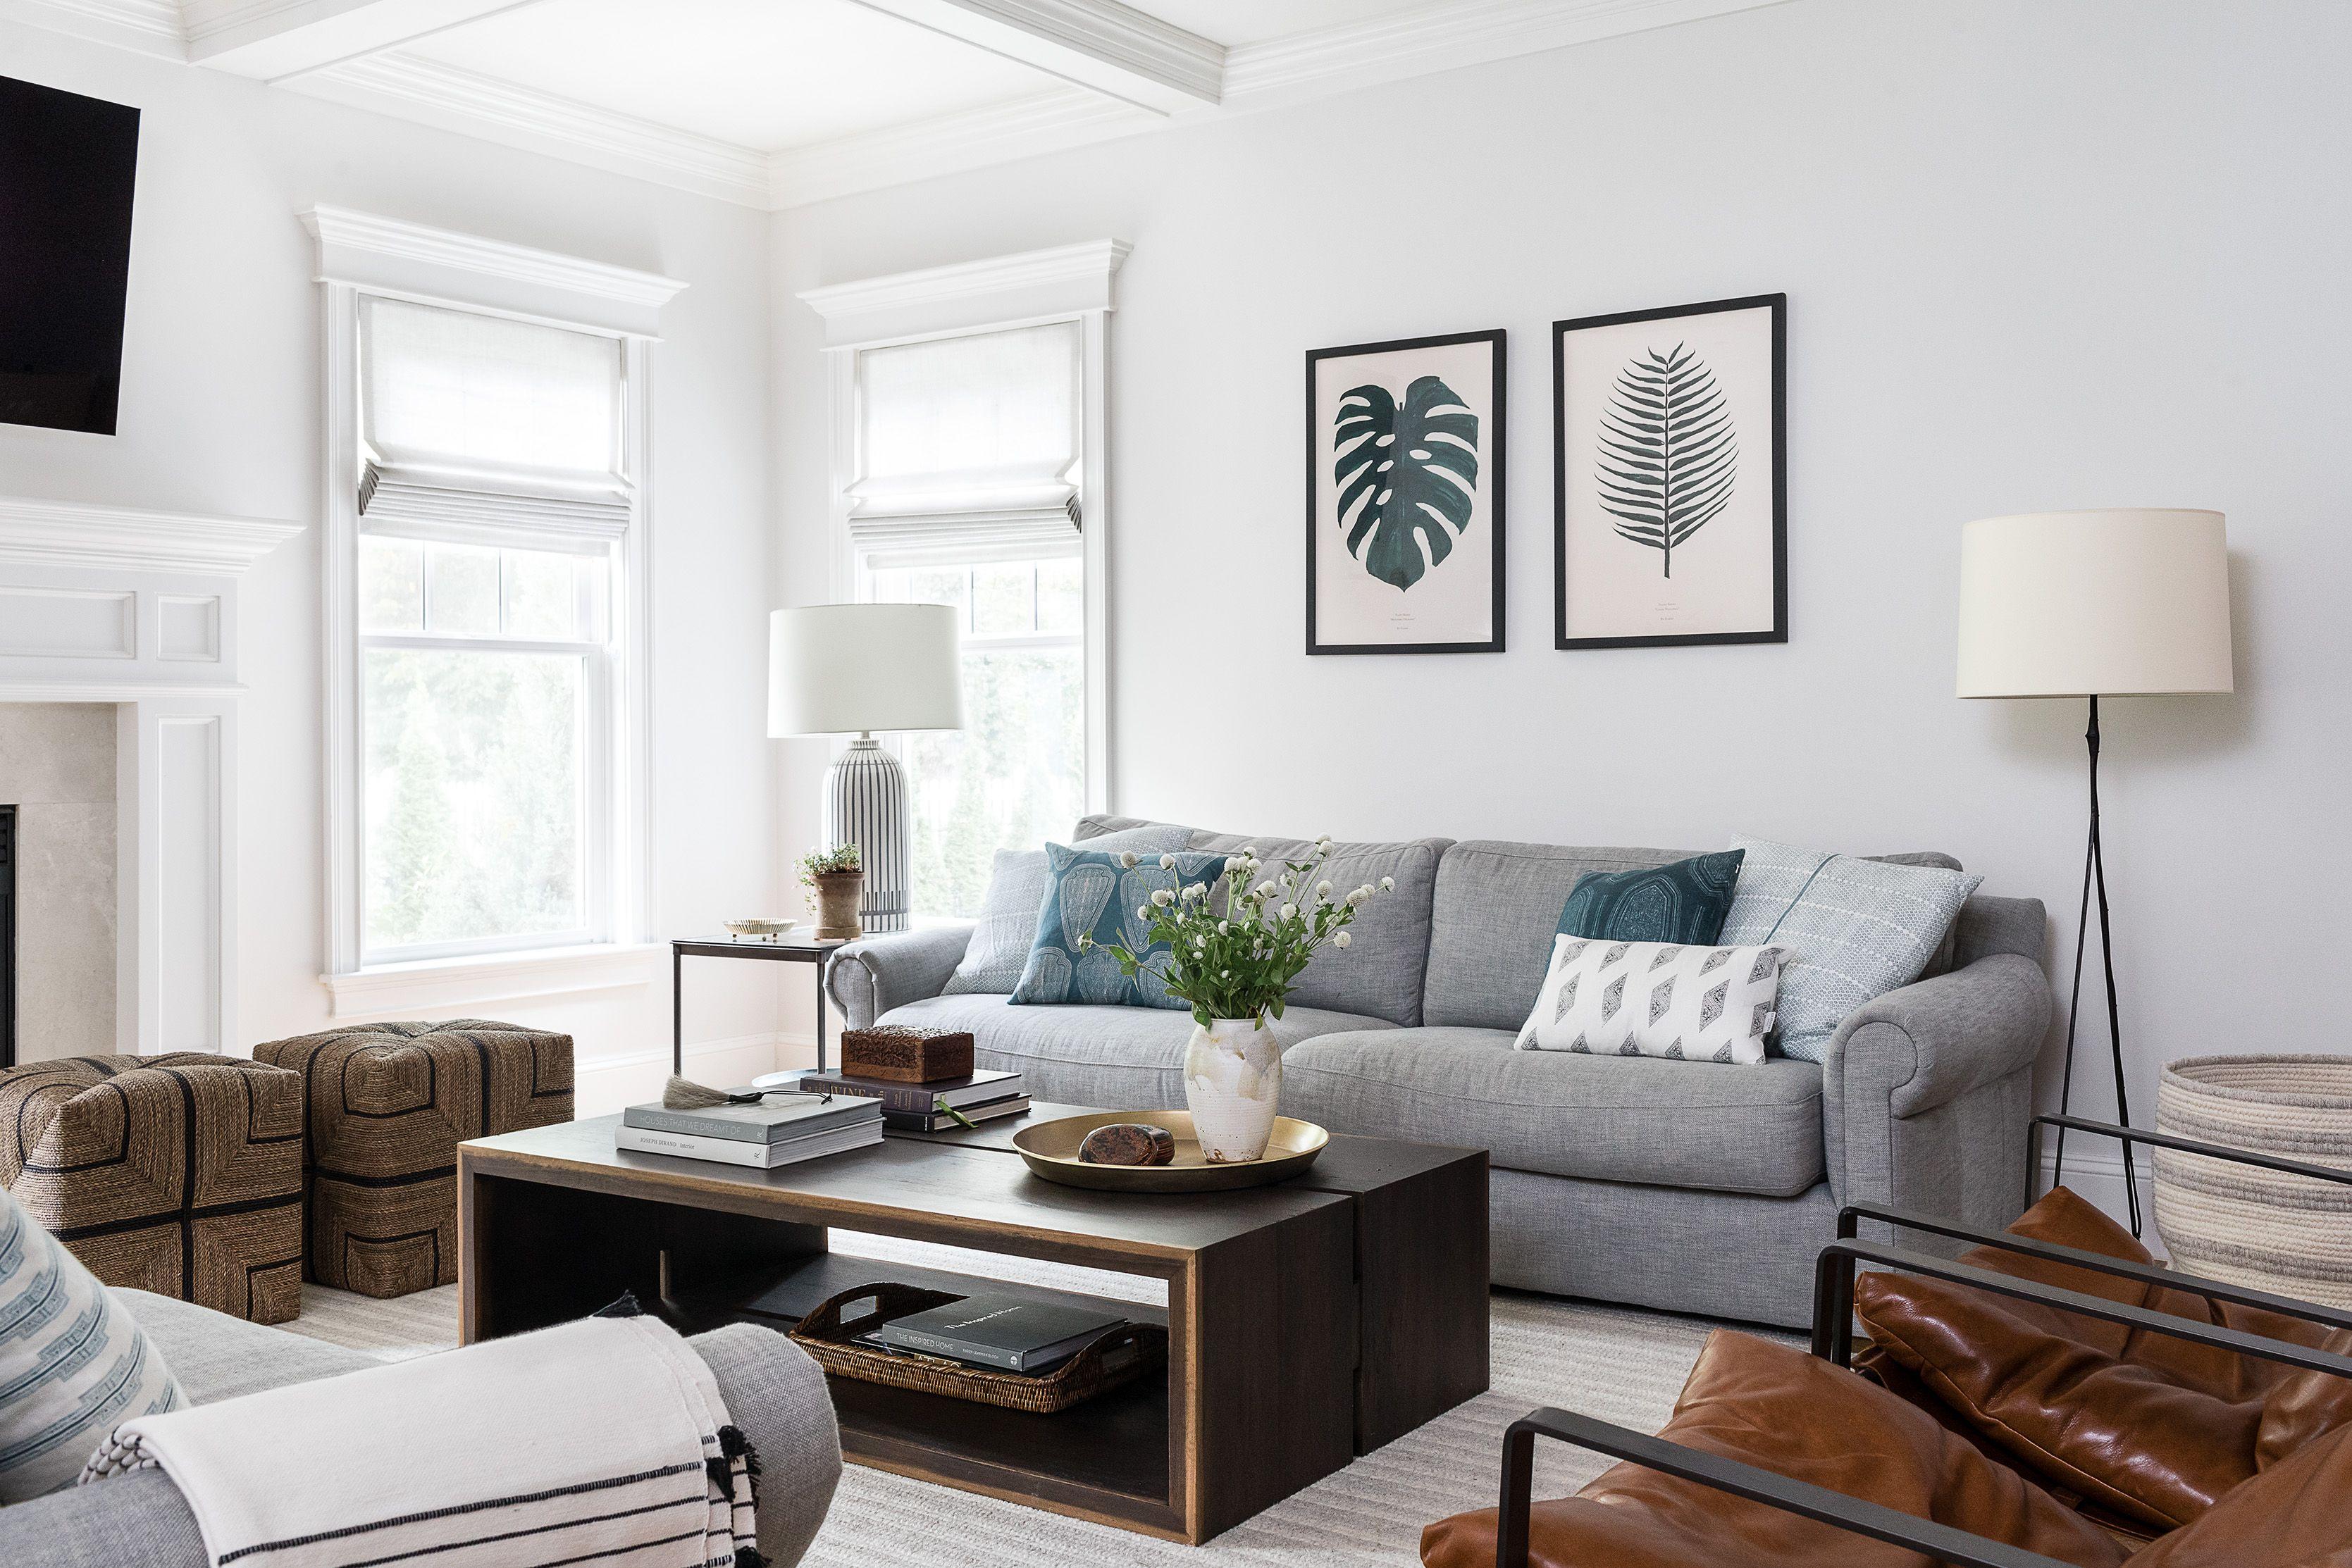 Boston Based Thayer Design Studio, Living Room Boston